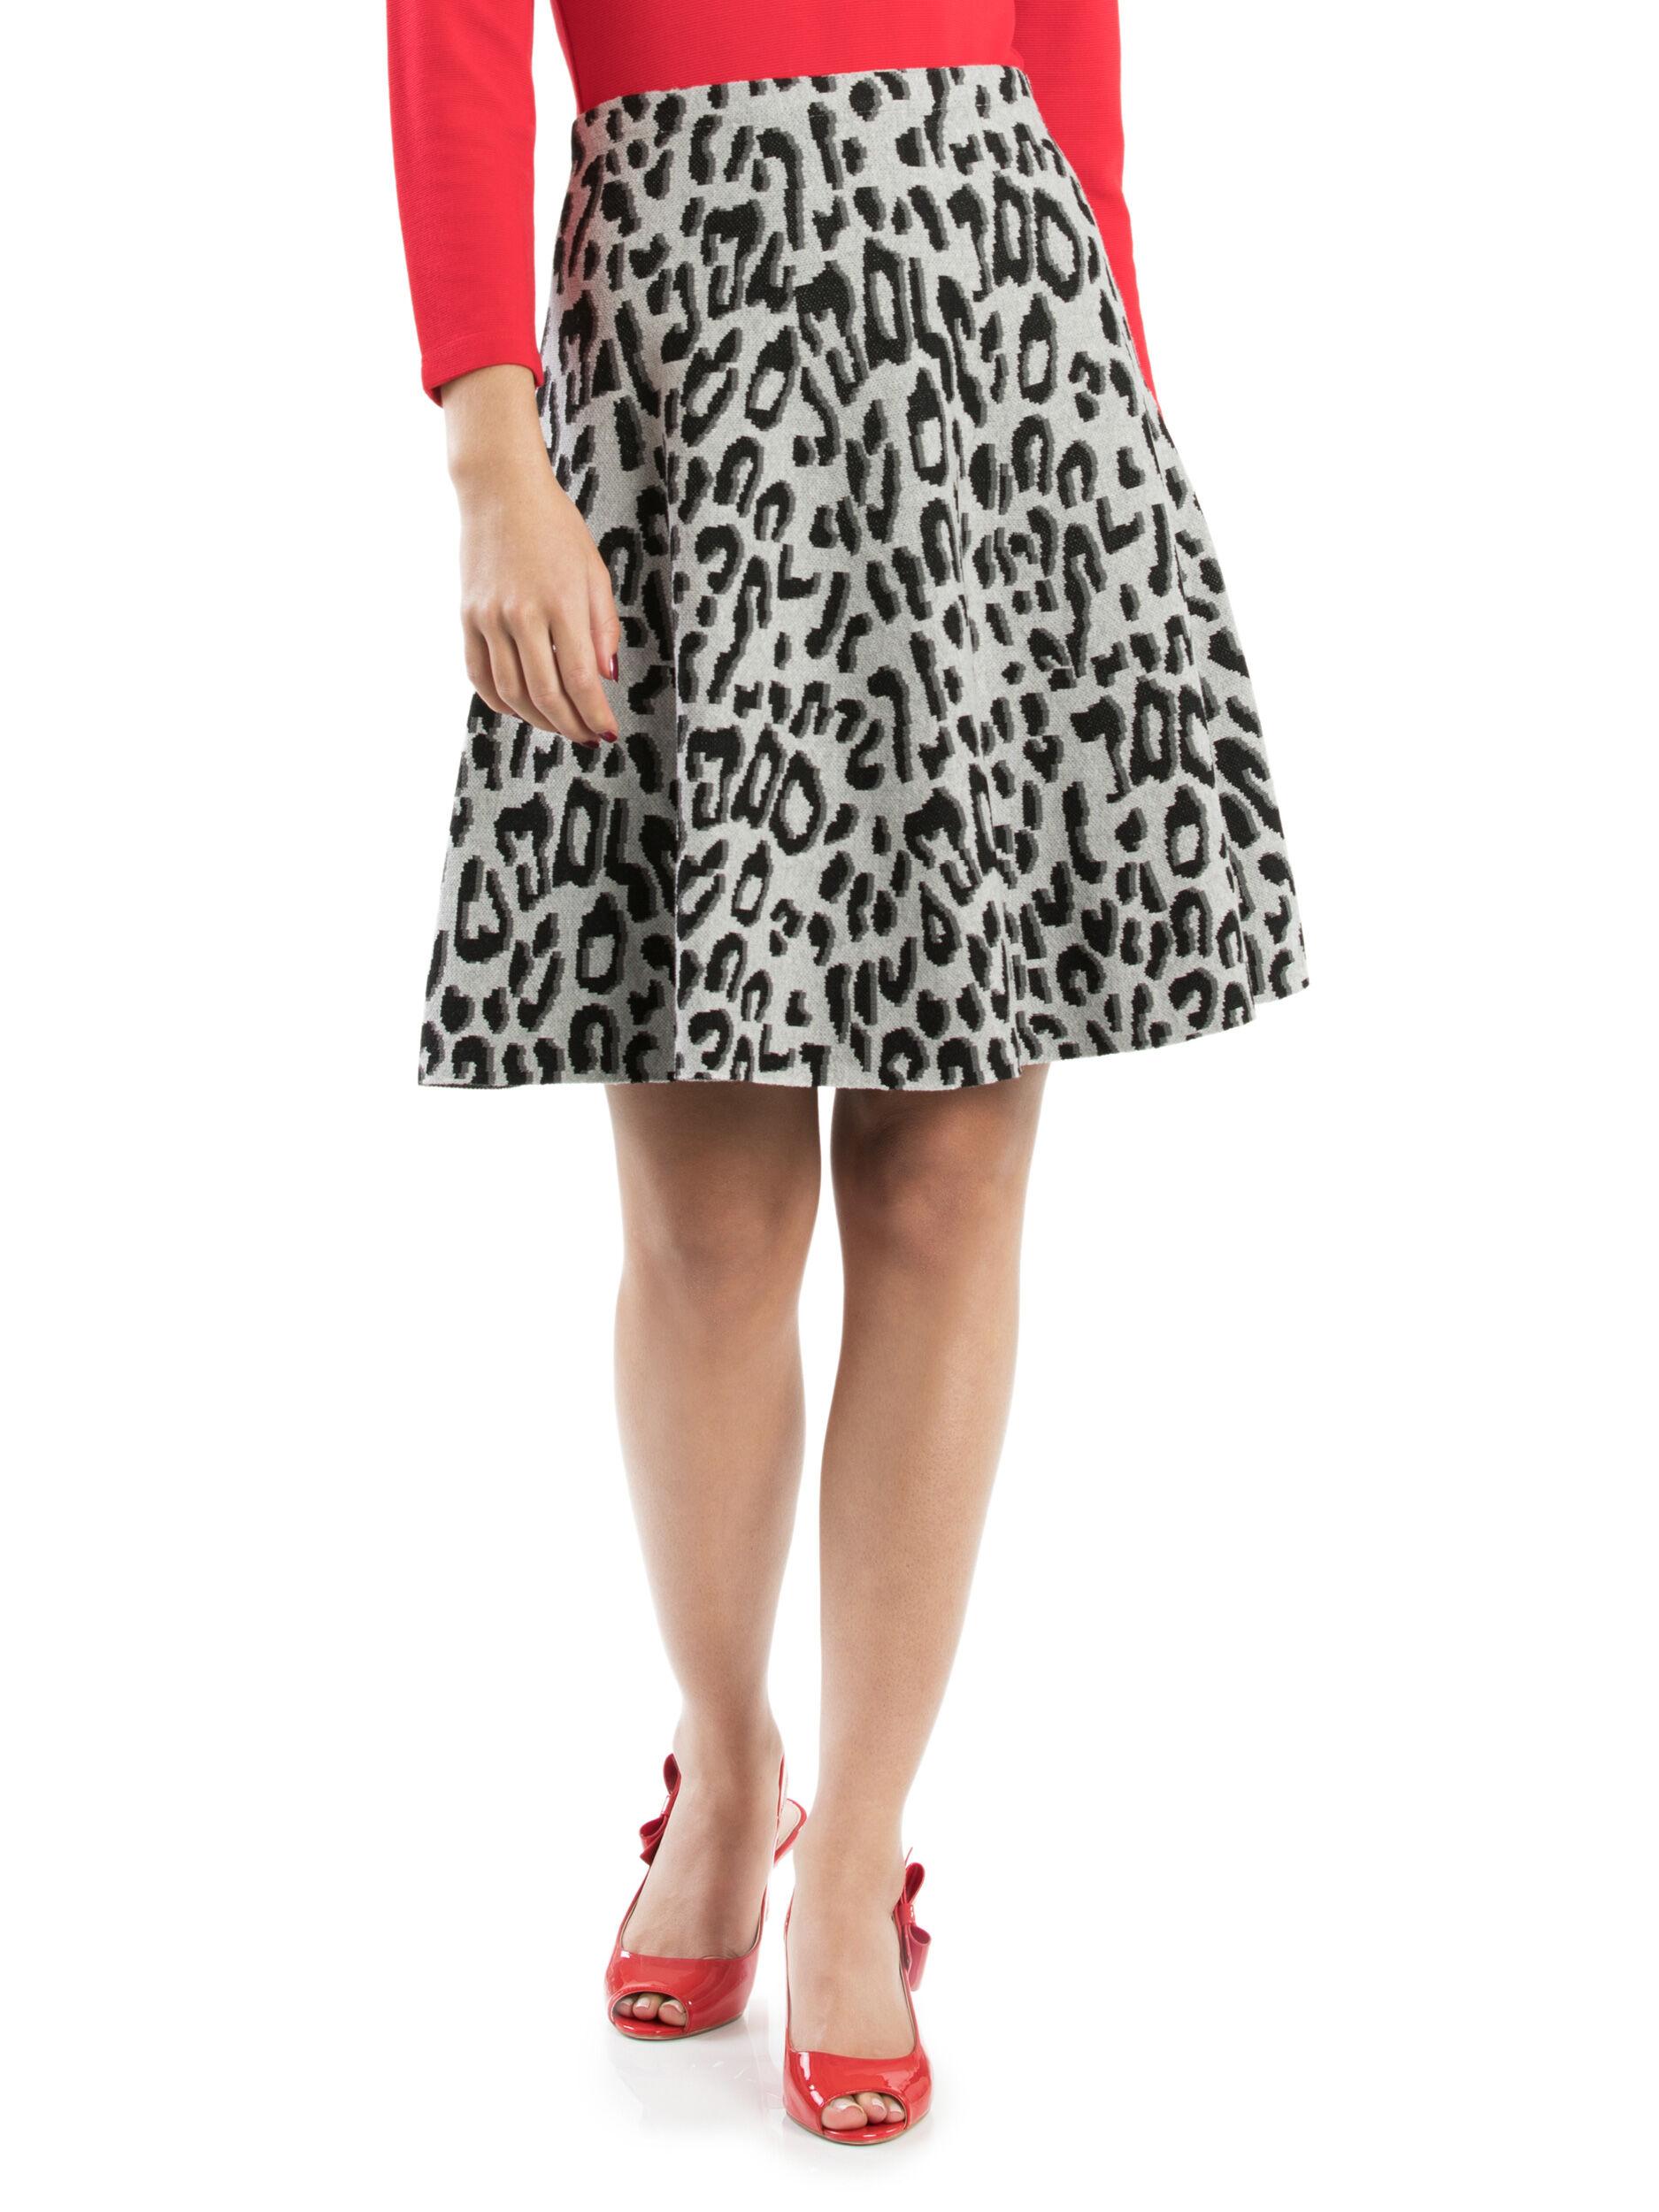 Snow Leopard Skirt